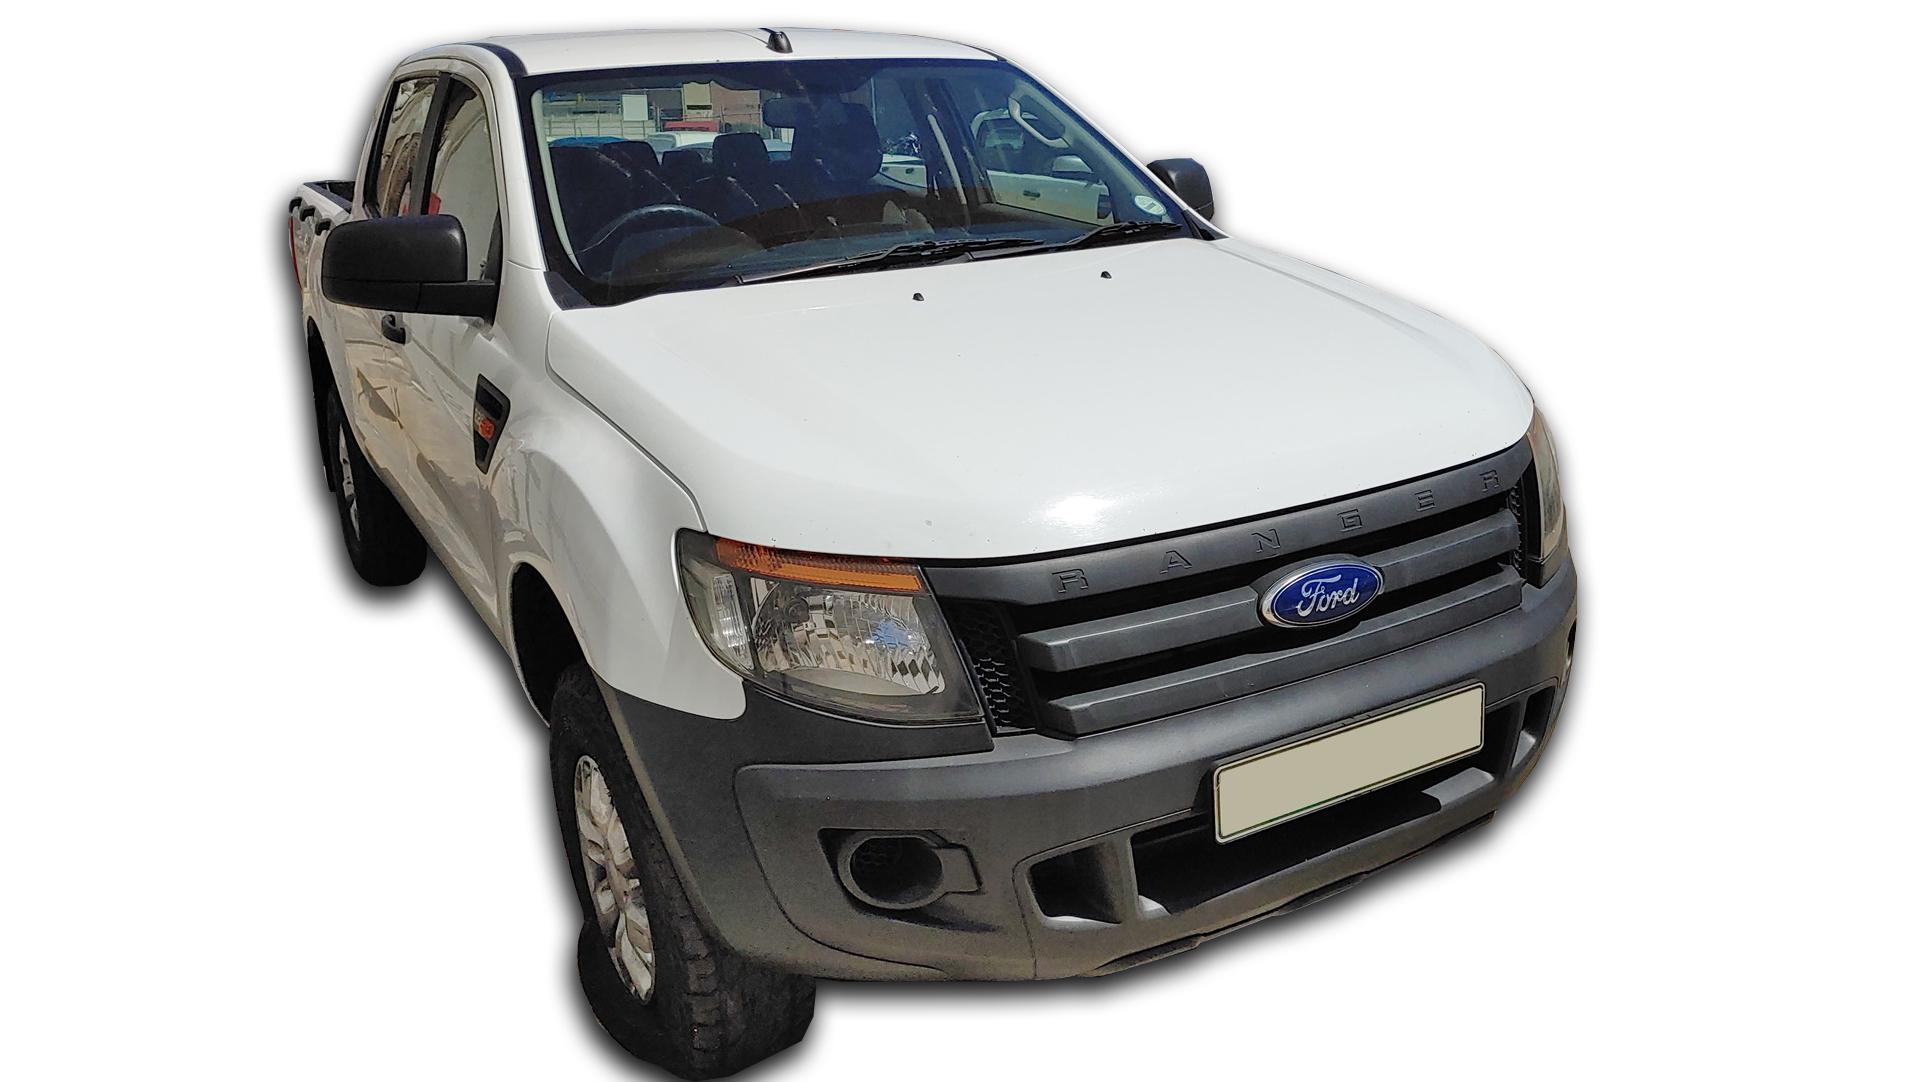 Ford Ranger 2.2 Tdci XL P/U D/C